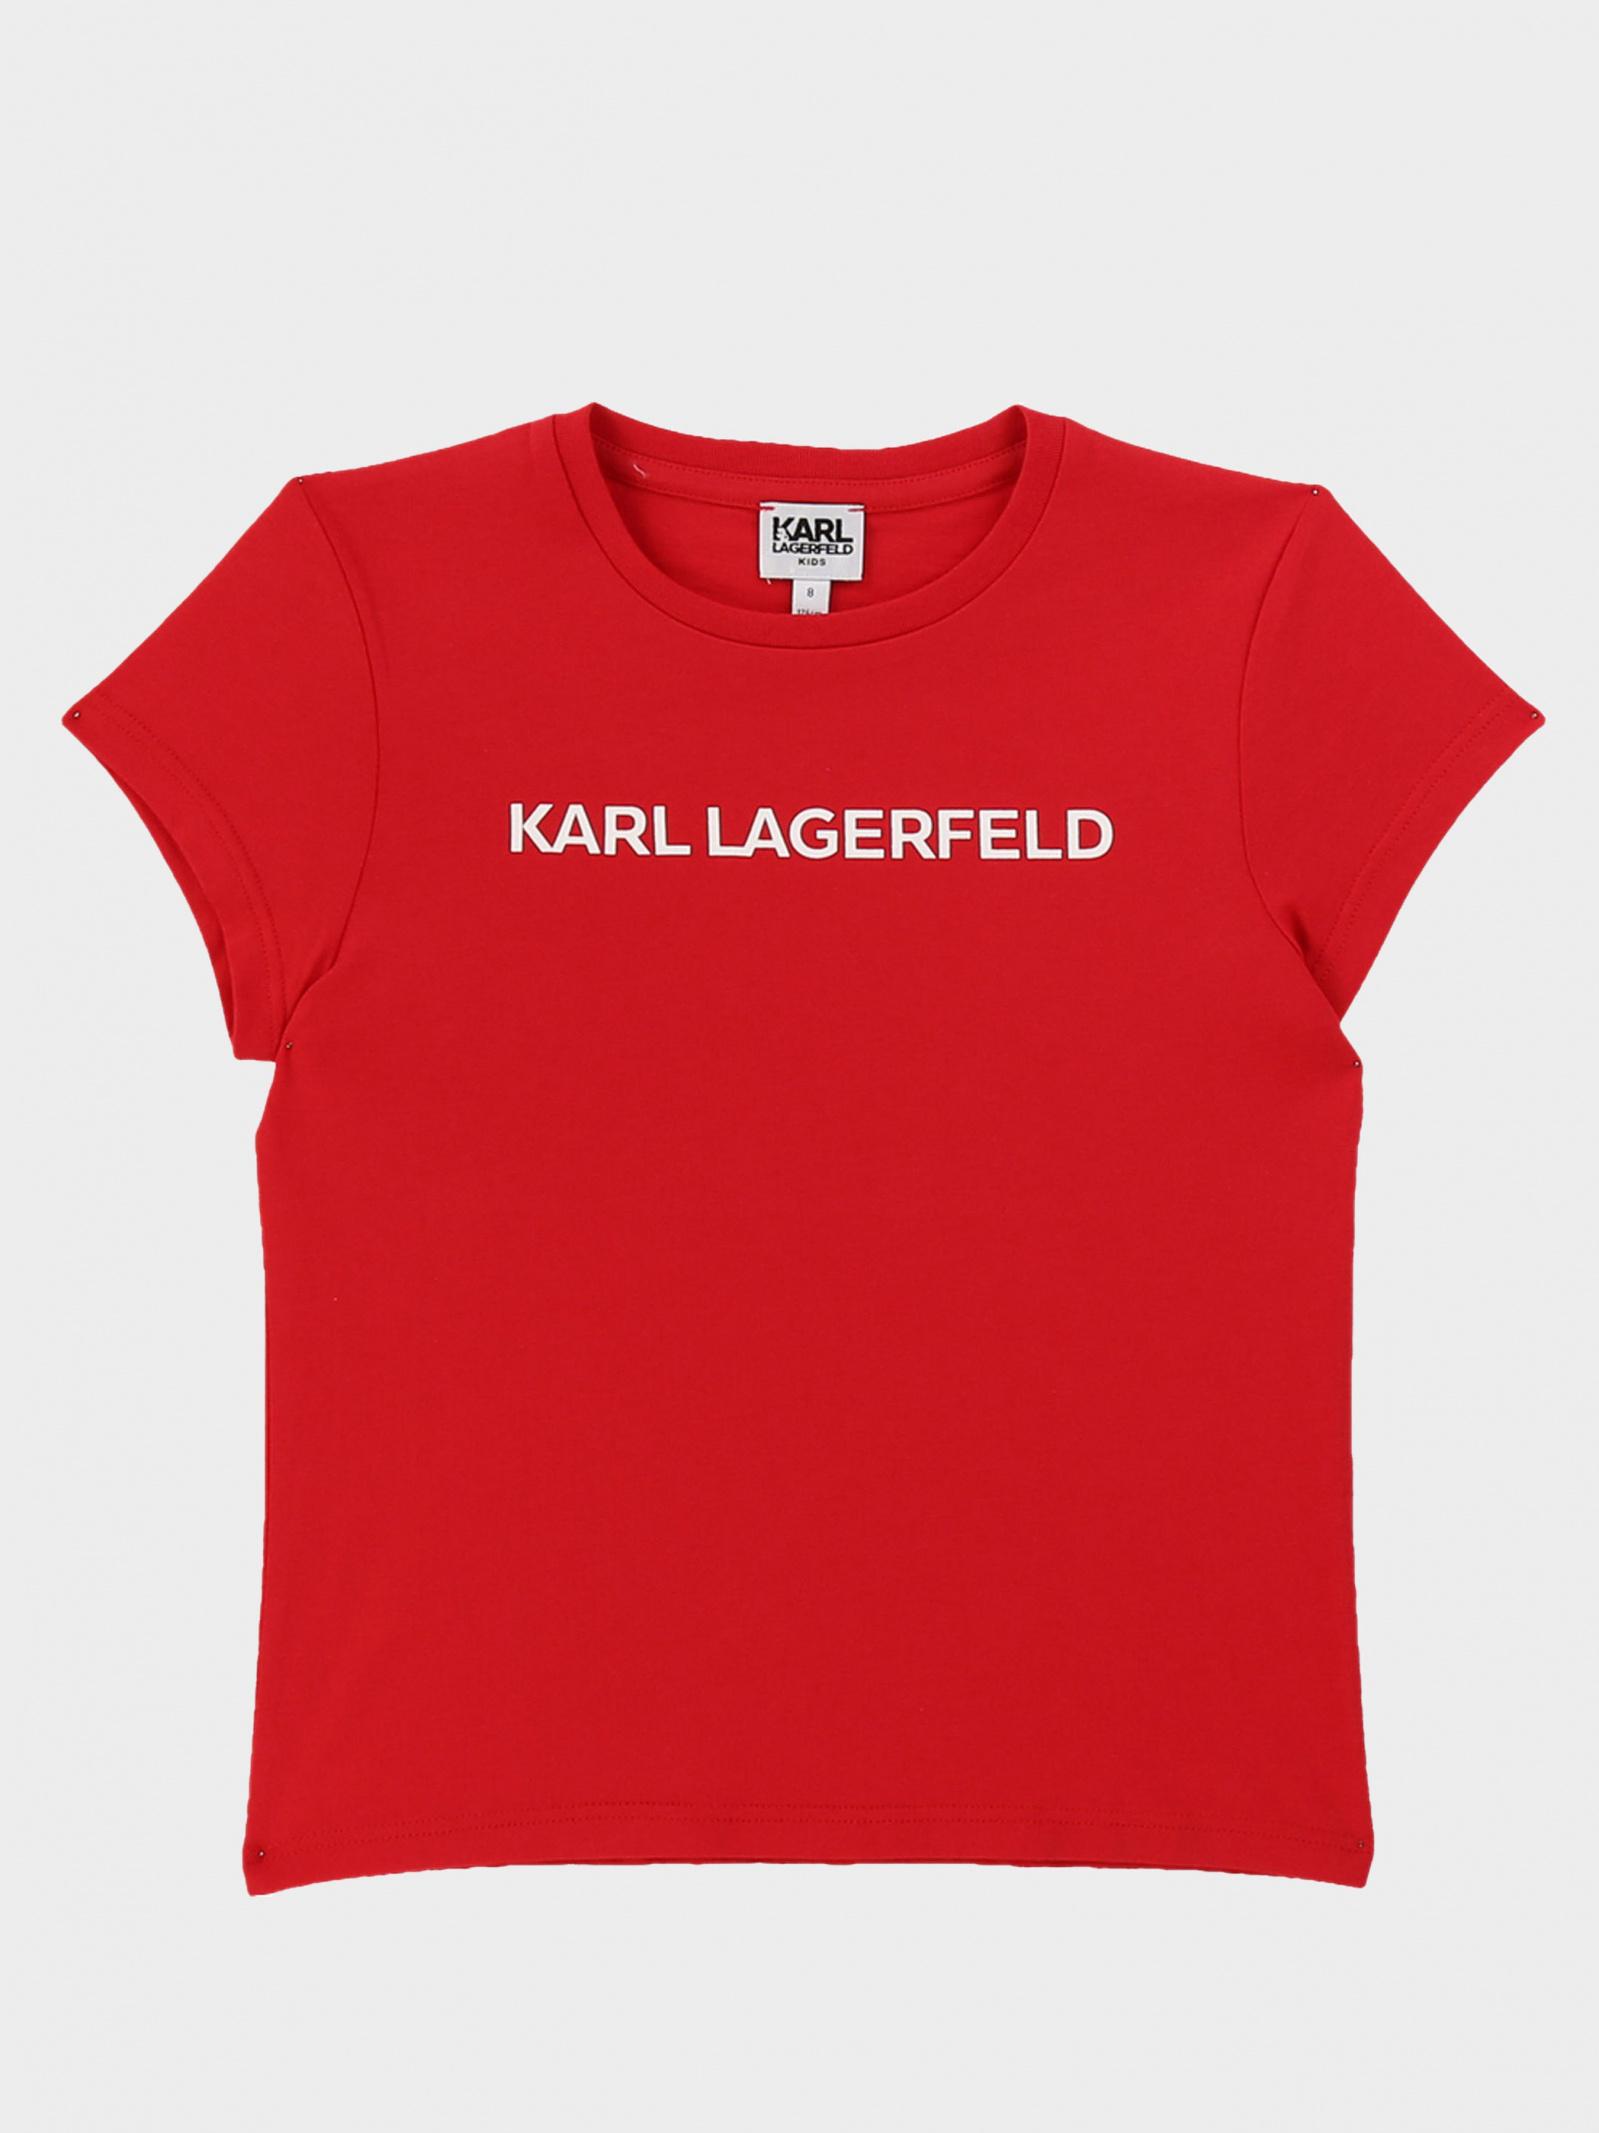 Футболка детские KARL LAGERFELD модель HR256 отзывы, 2017